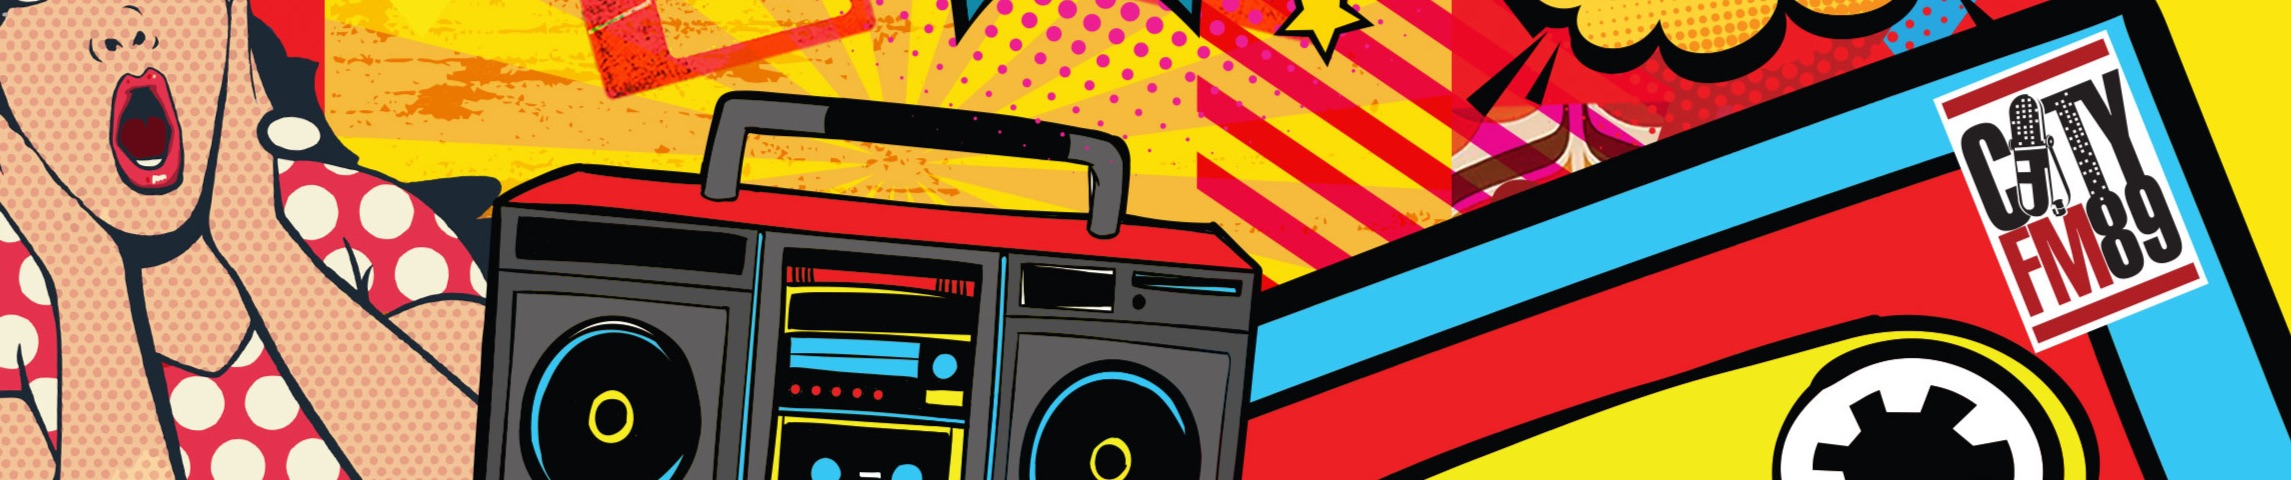 CityFM89 | City FM89 | Free Listening on SoundCloud